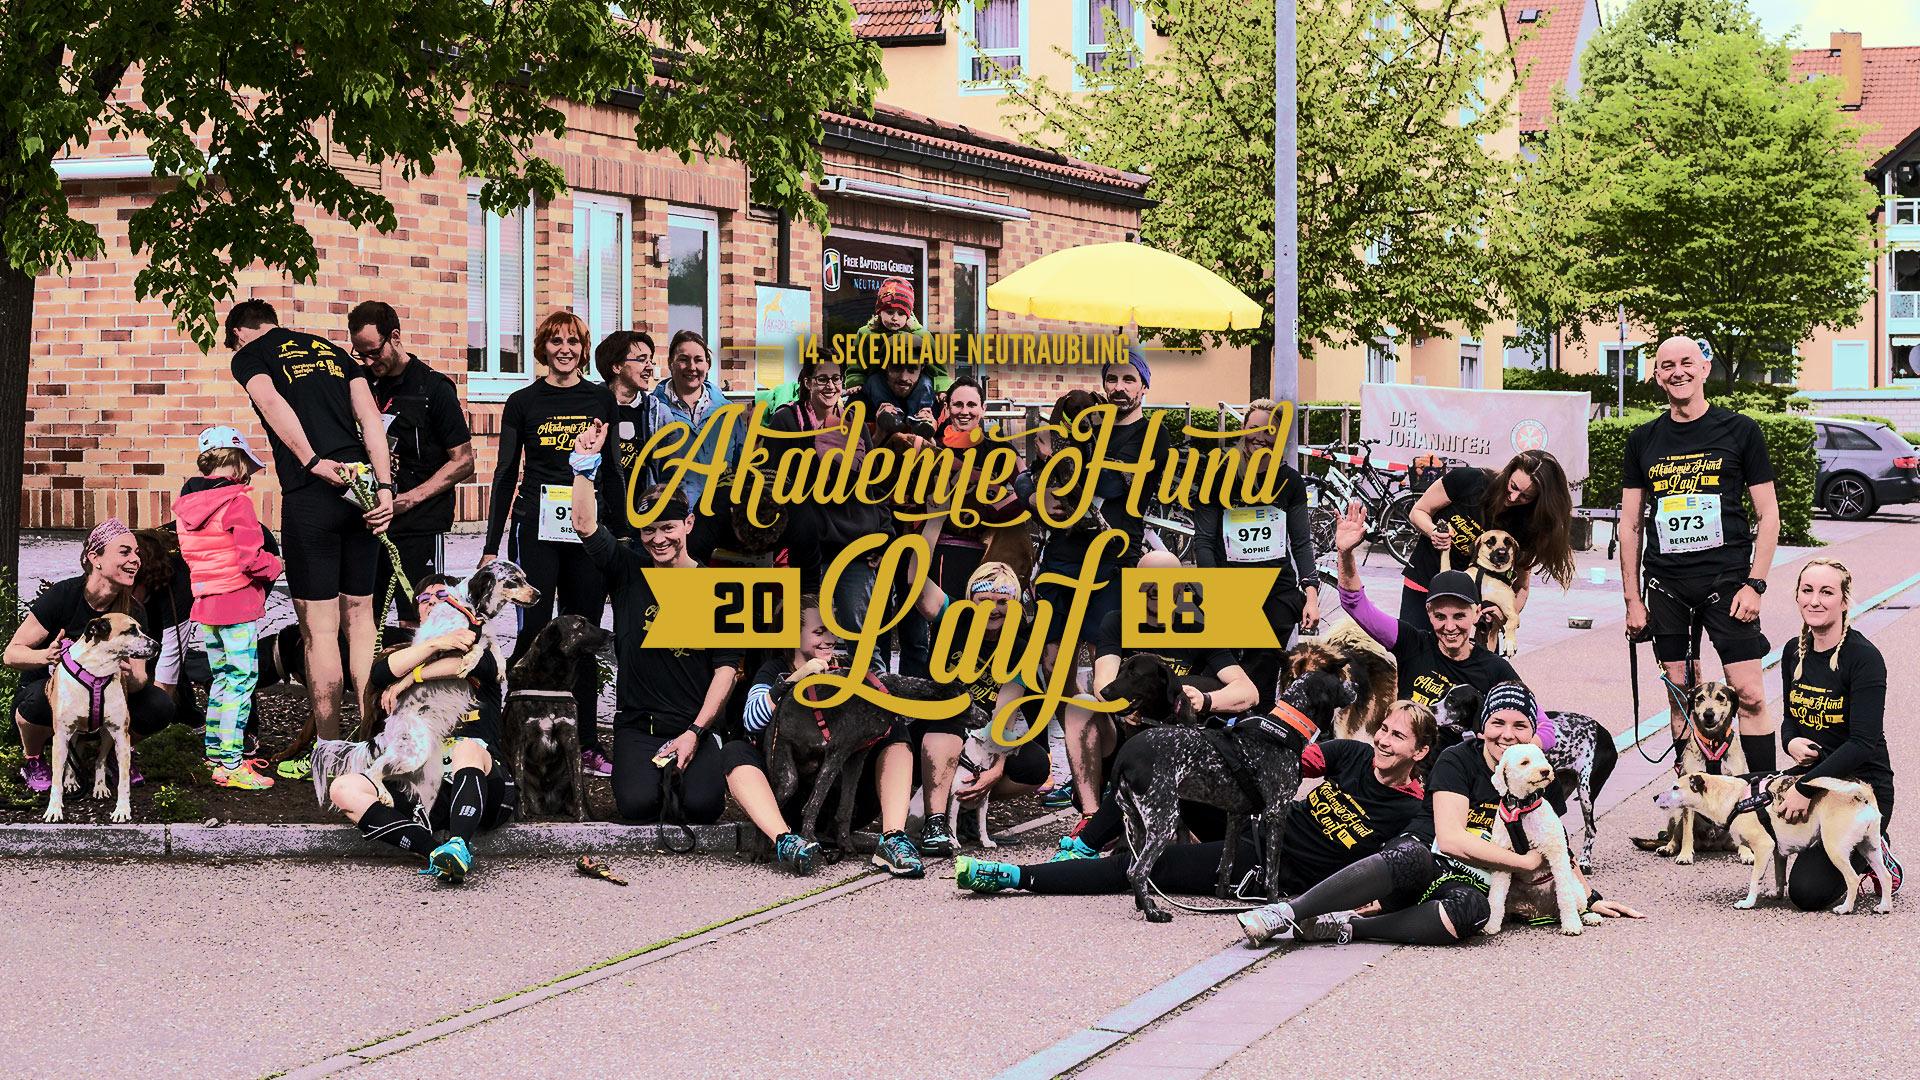 Akademie Hund Lauf, 14. Se(e)hlauf Neutraubling 2018, Anmeldung